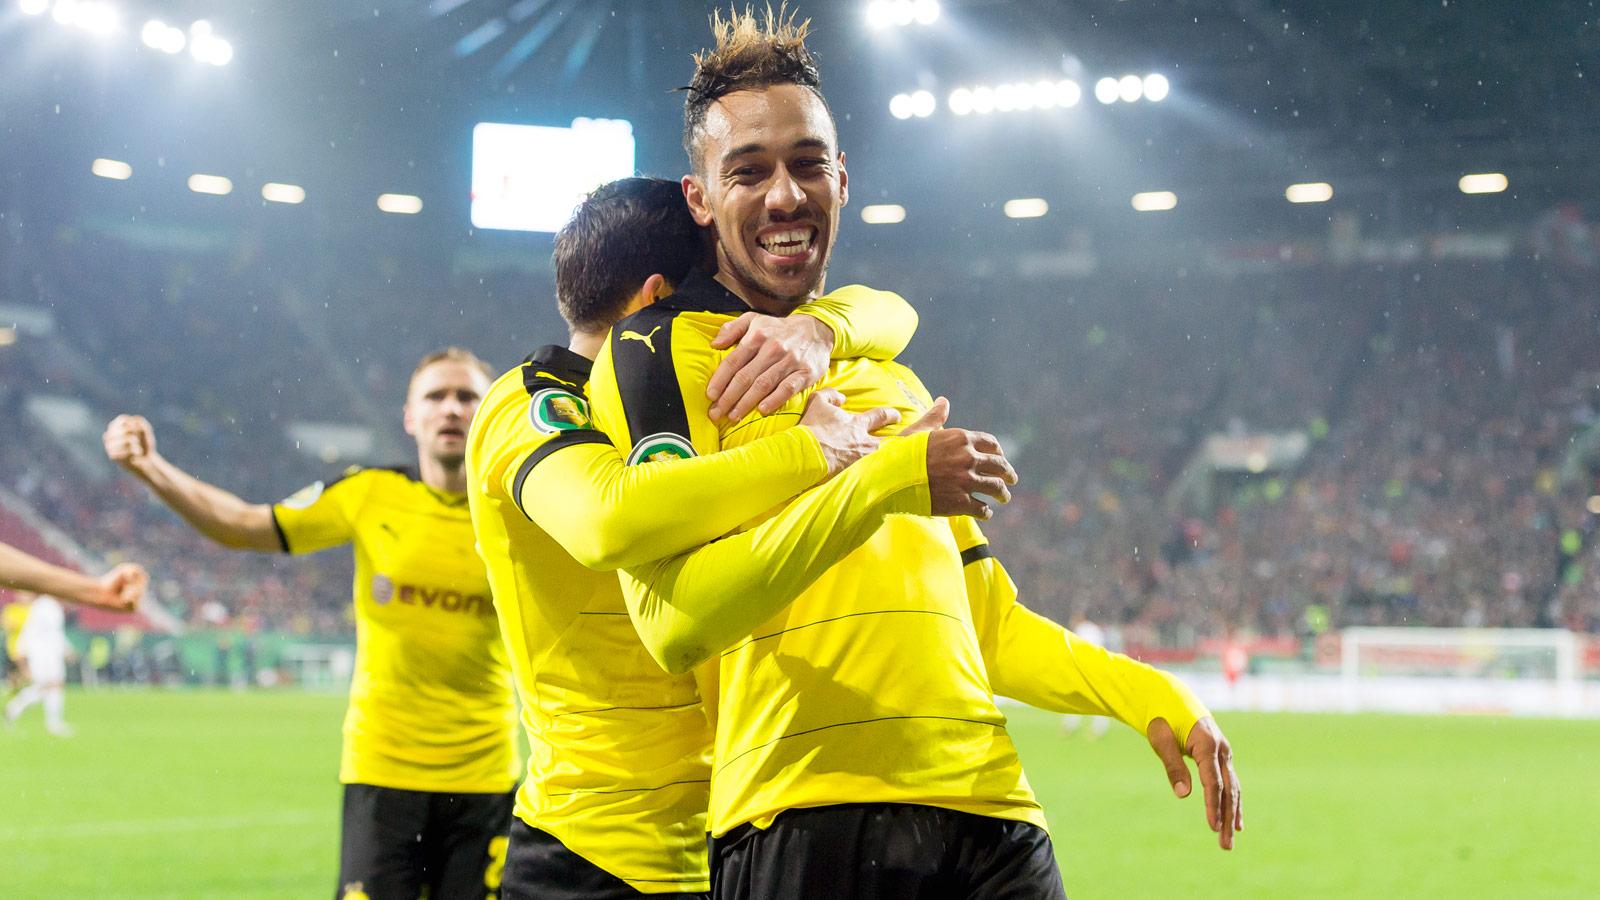 Arsenal target shock move for Dortmund striker Aubameyang